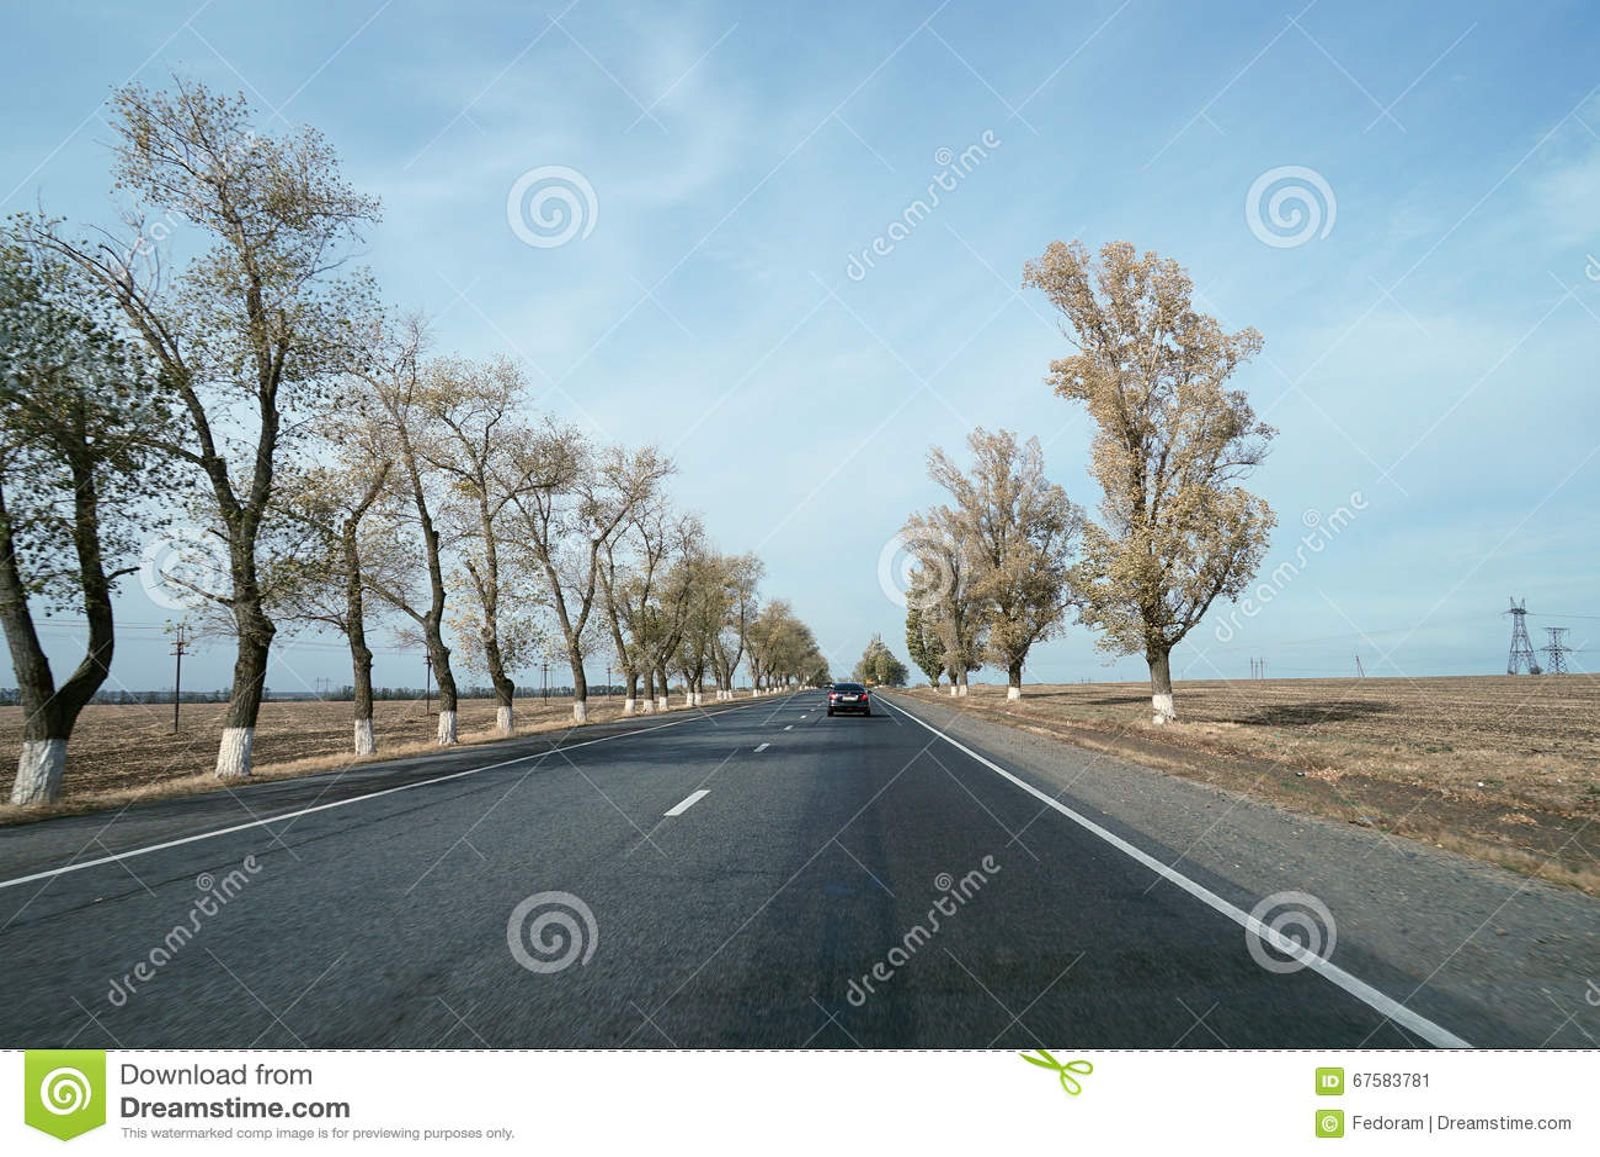 blue road nature photo - photo #11